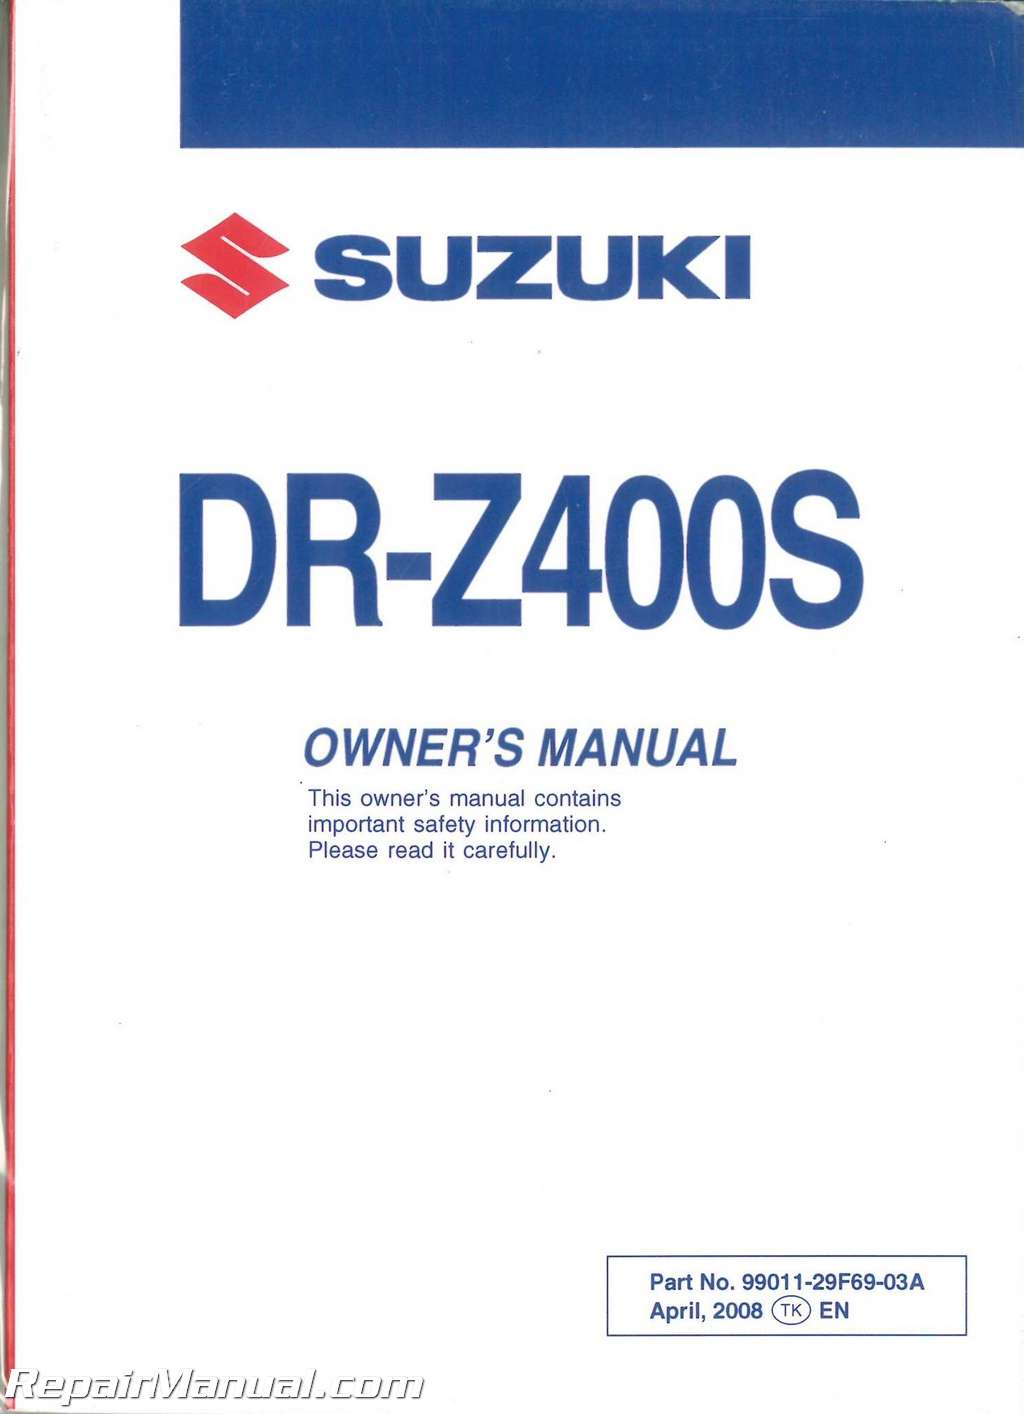 Suzuki Drz400s Owners Manual Ca77 Wiring Diagram 2009 Dr Z400s Motorcycle Rh Repairmanual Com Service Pdf 2007